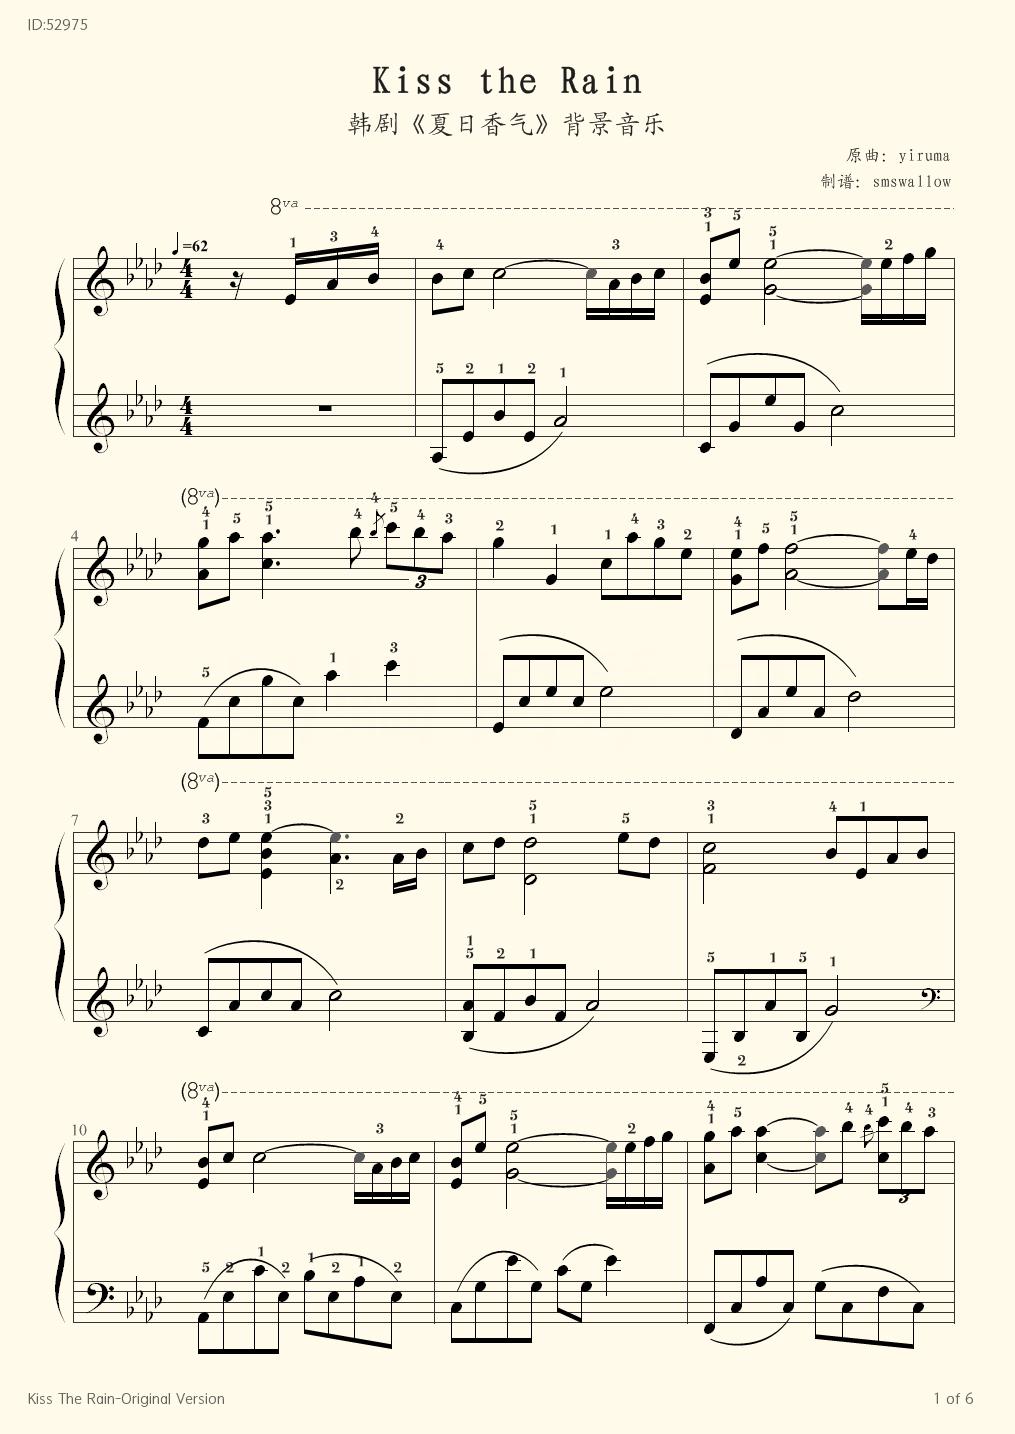 Kiss The Rain Original Version - Yiruma - first page